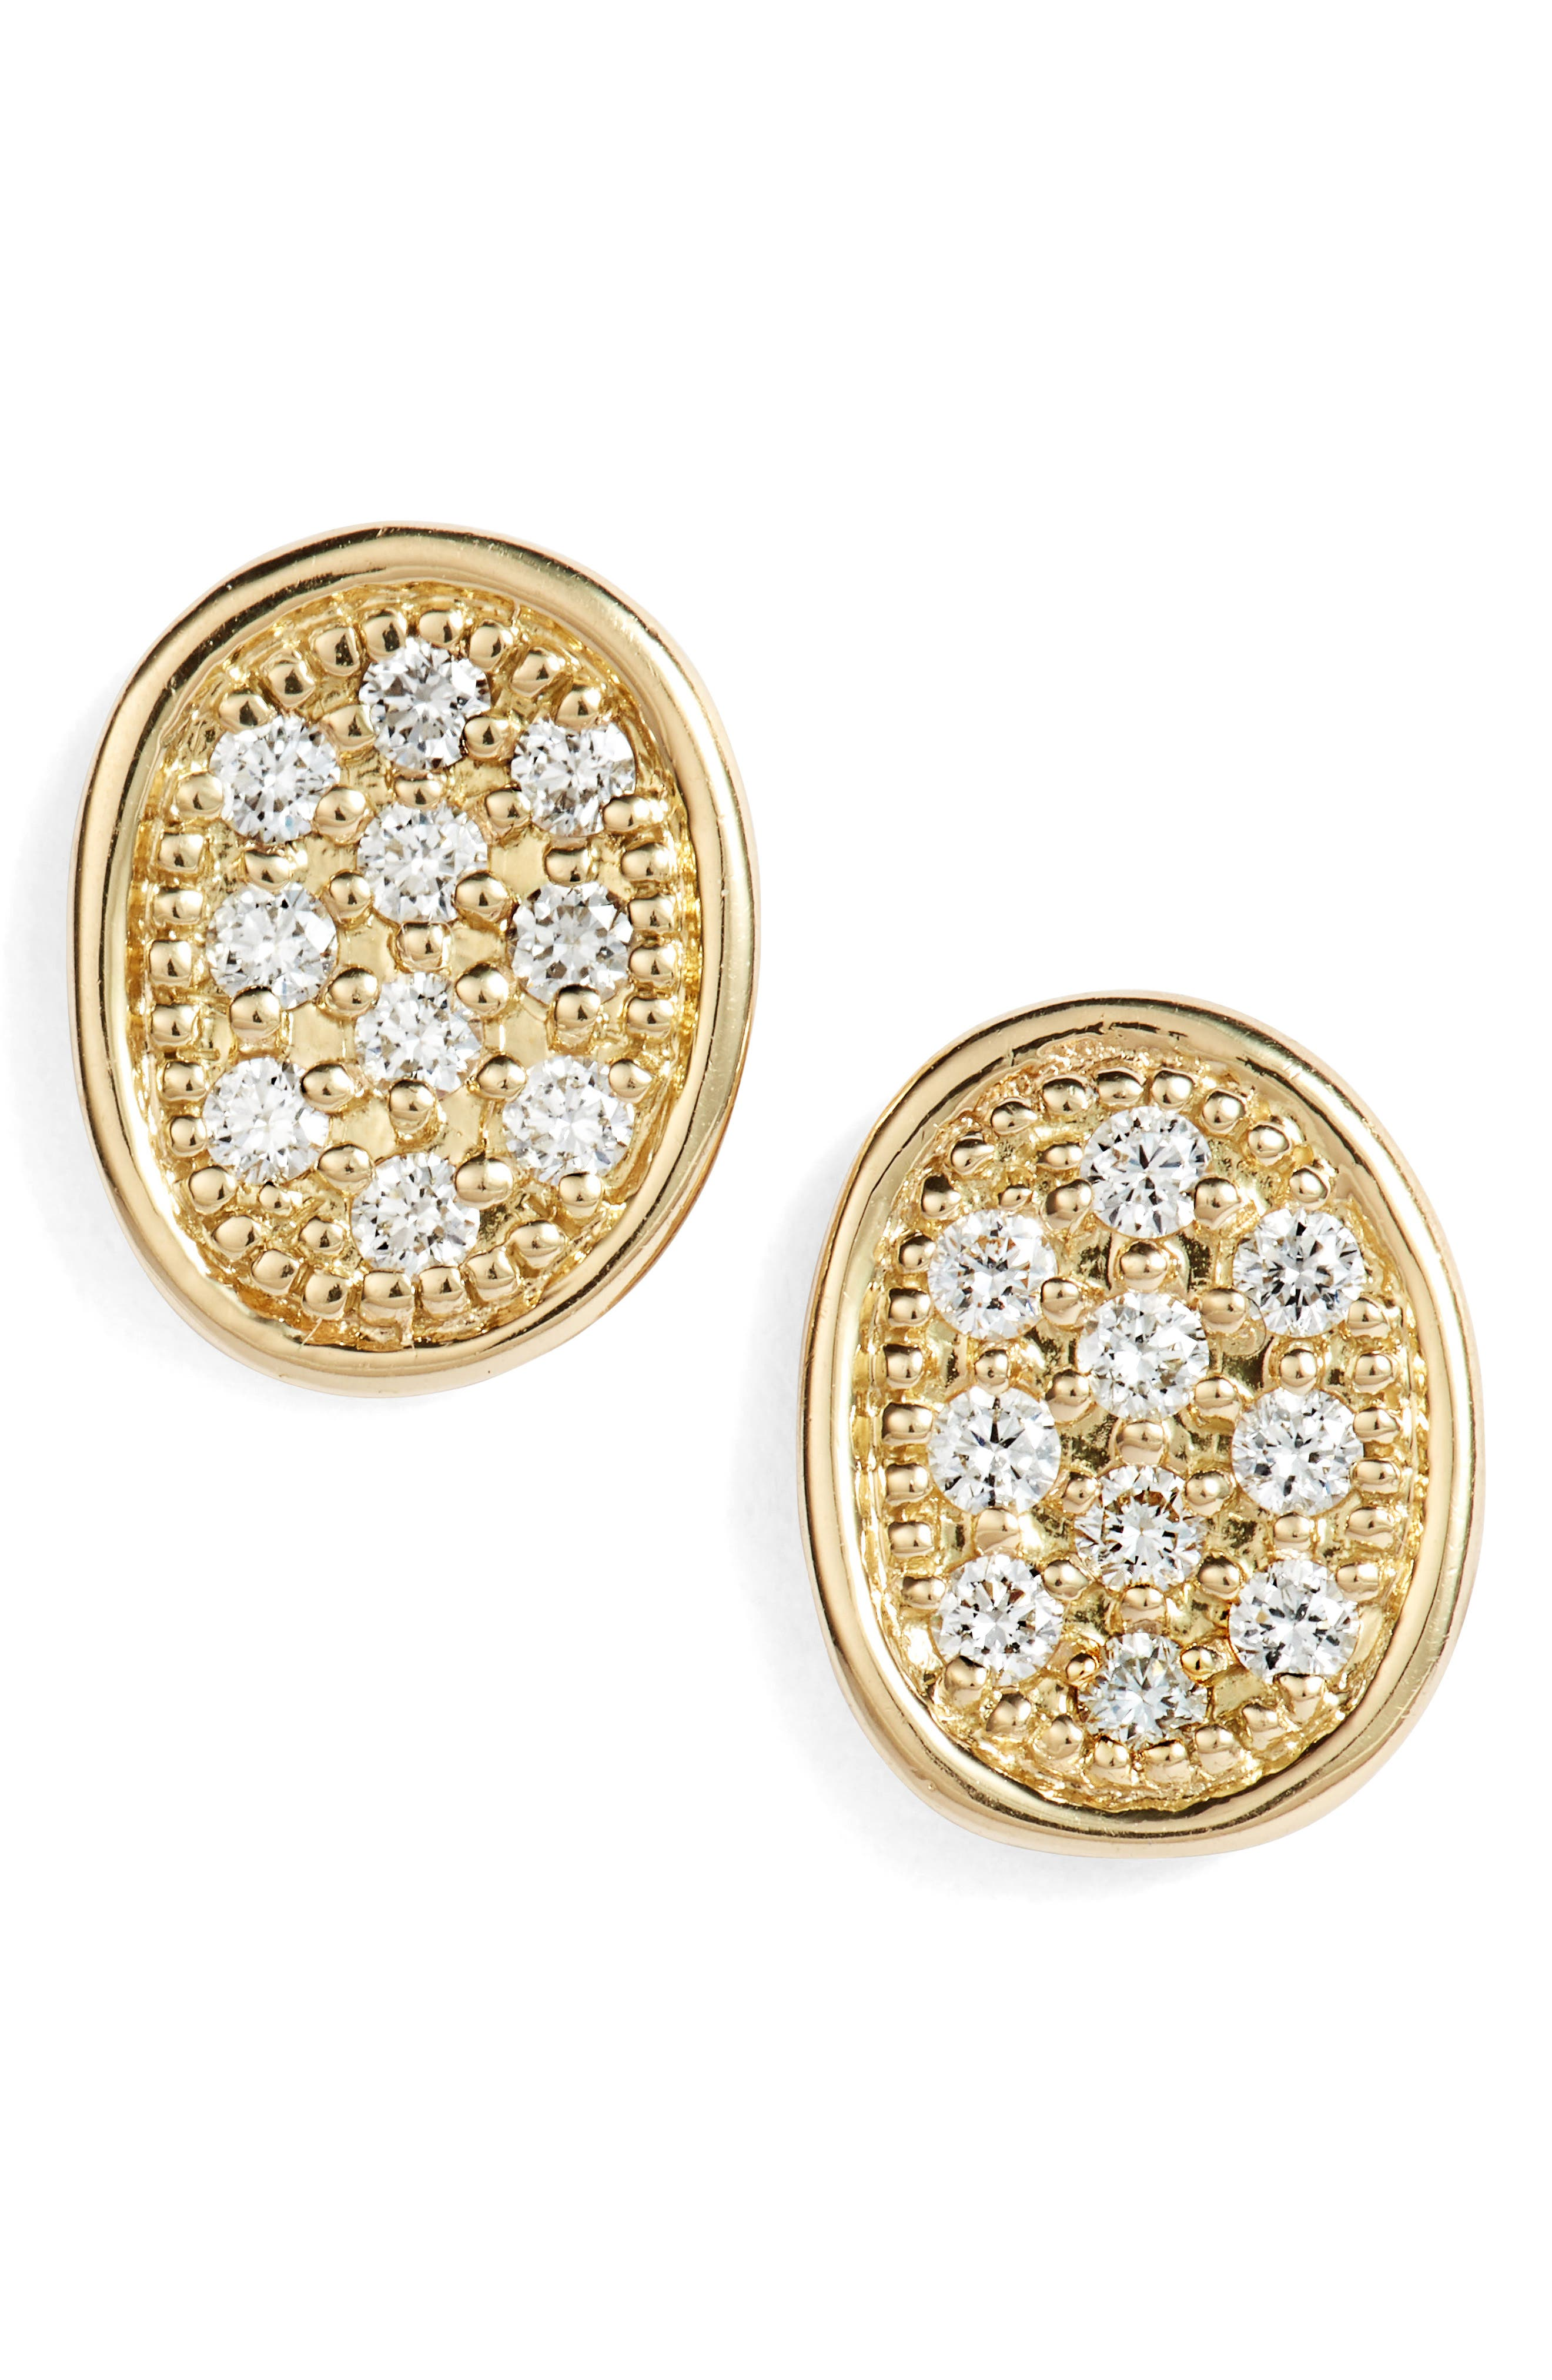 MARCO BICEGO LUNARIA DIAMONDS EARRINGS